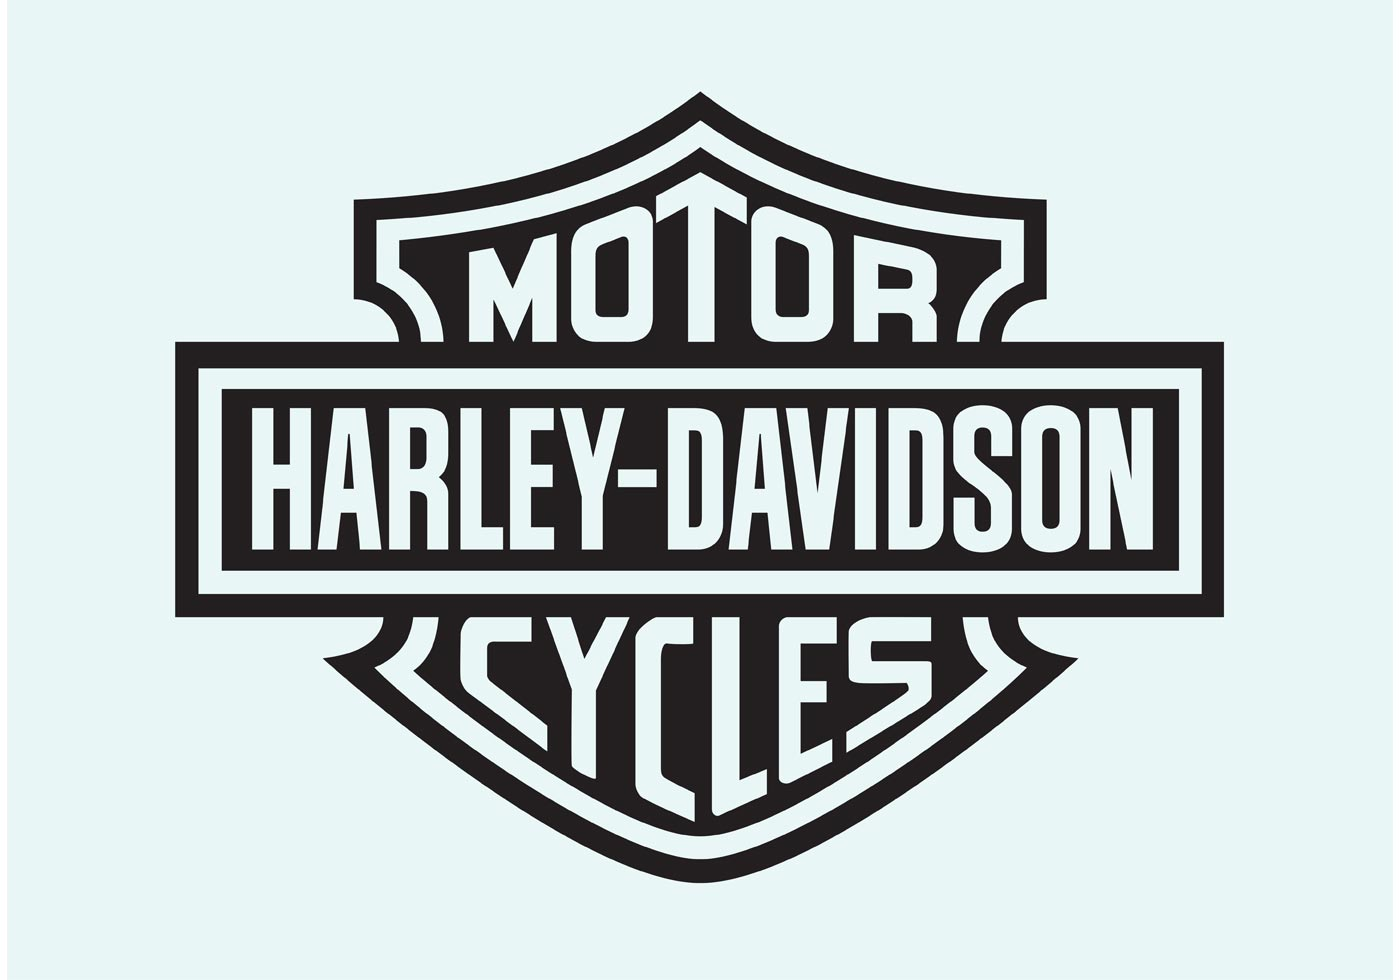 Harley Davidson Motorcycle Free Vector Art.